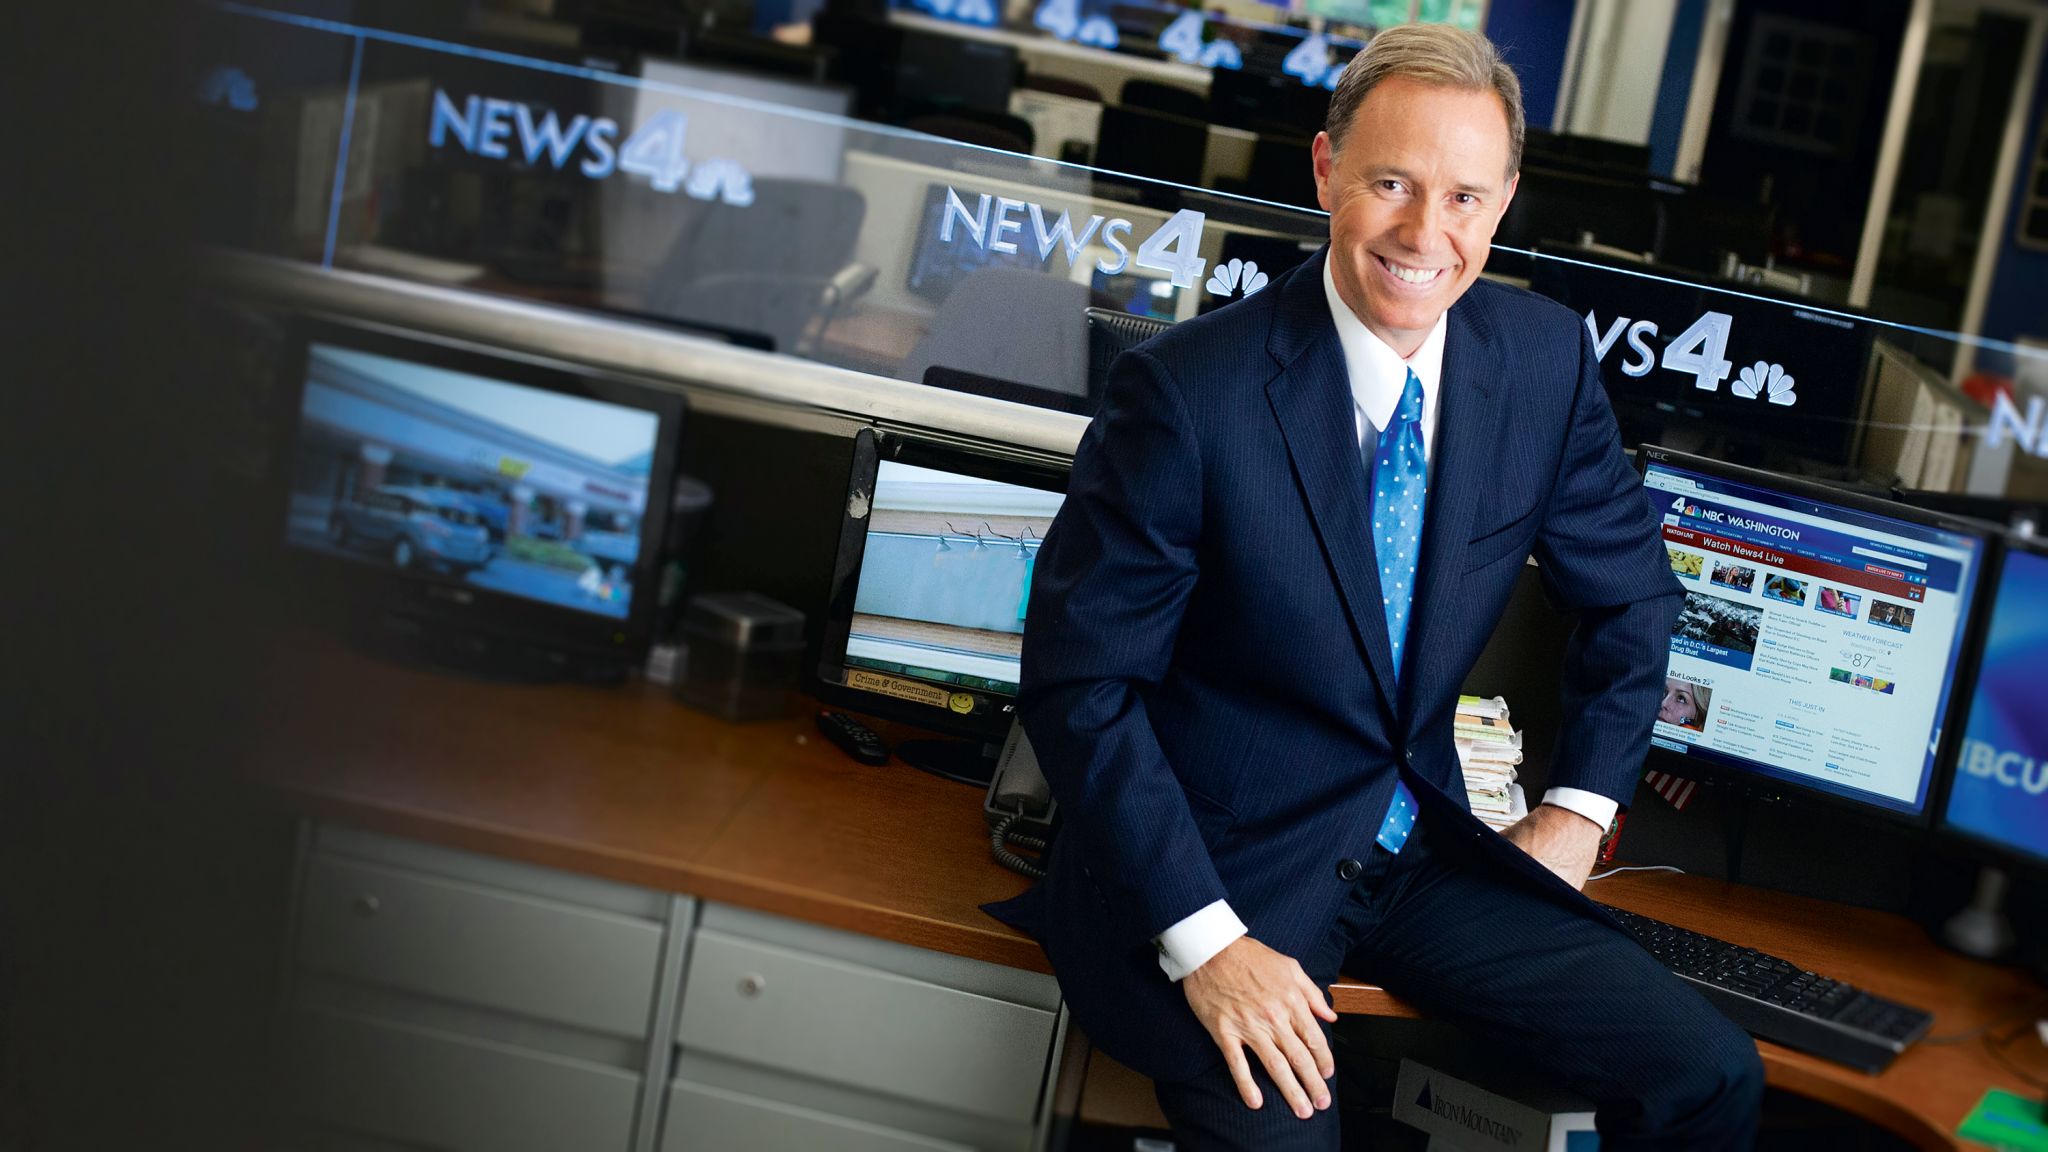 Jim Handly Is the News Anchor Washington Needs | Washingtonian (DC)